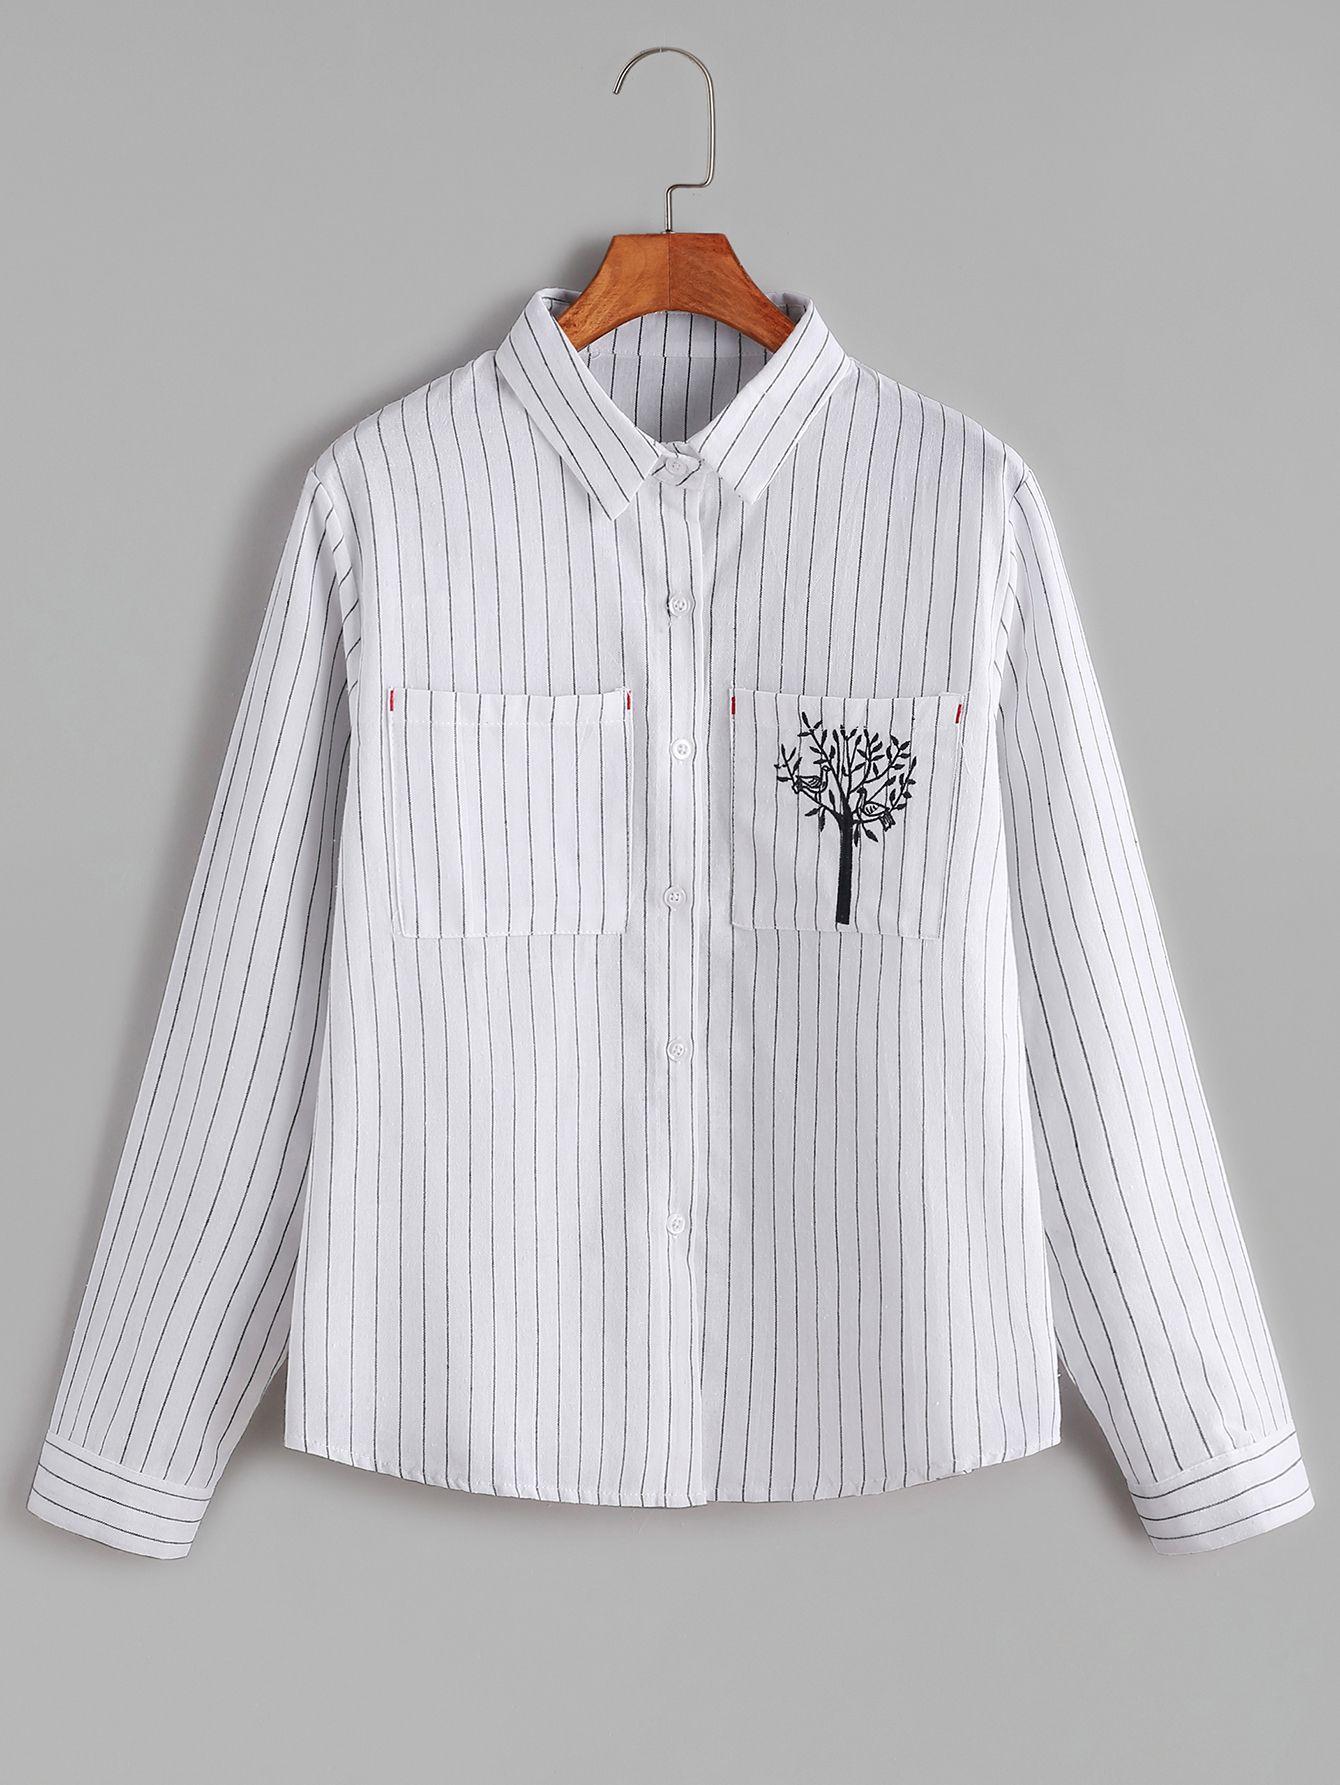 i just love this shein shirt